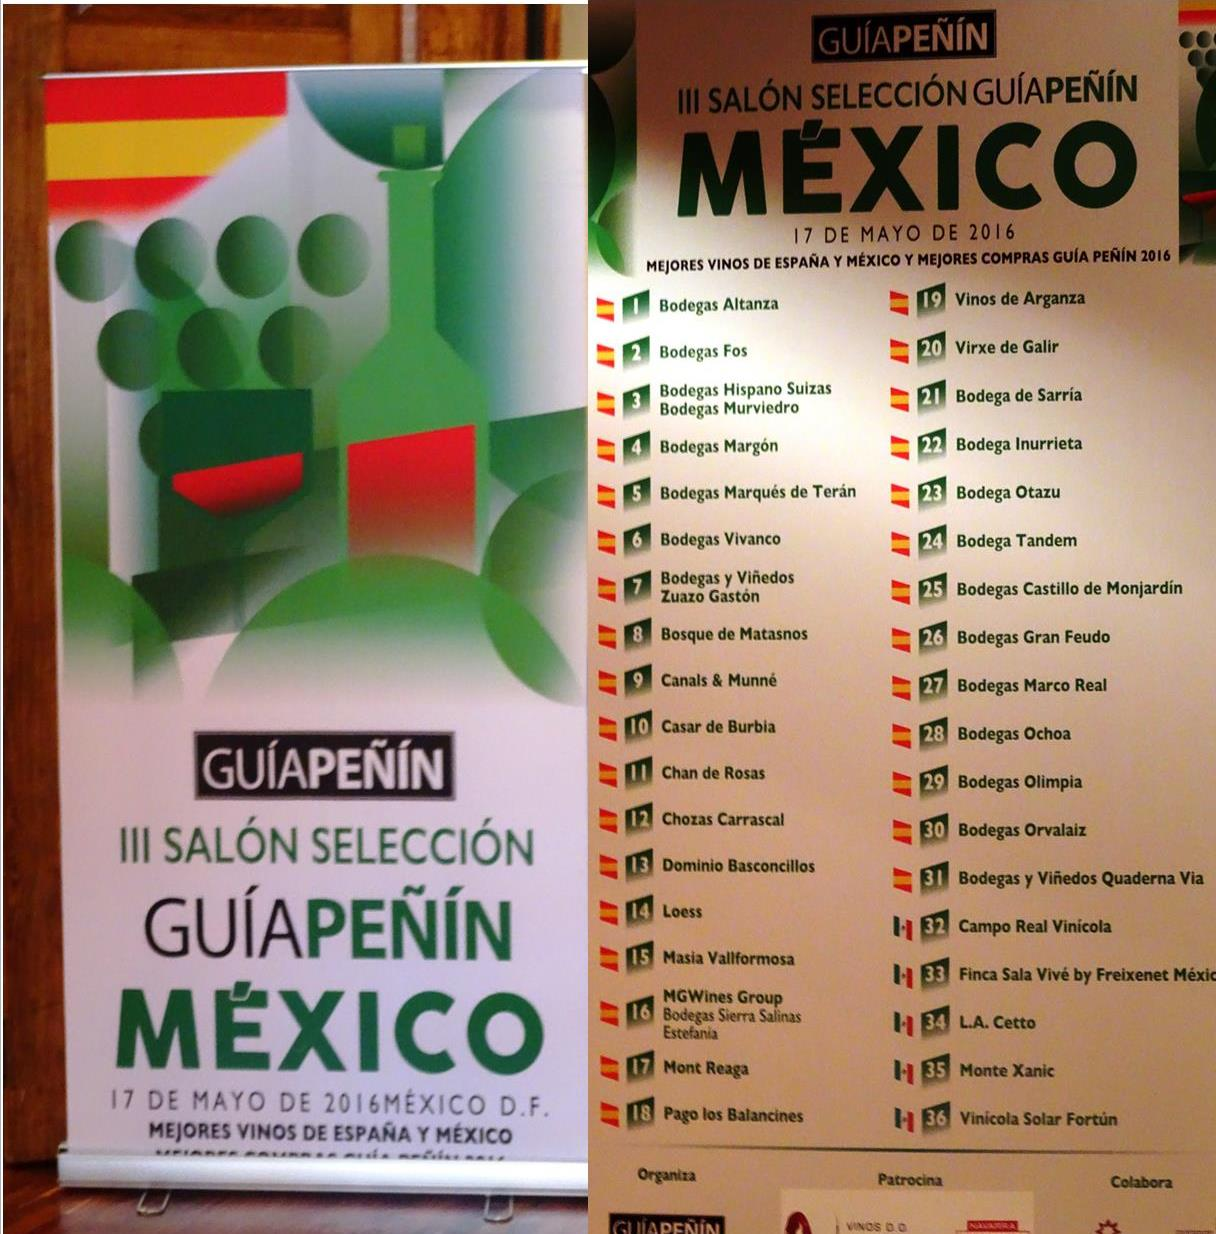 Guia Peñín 2016 visita México. / 2016 Peñín Wine-Selection Guide visits México.(M.A.Gallardo)